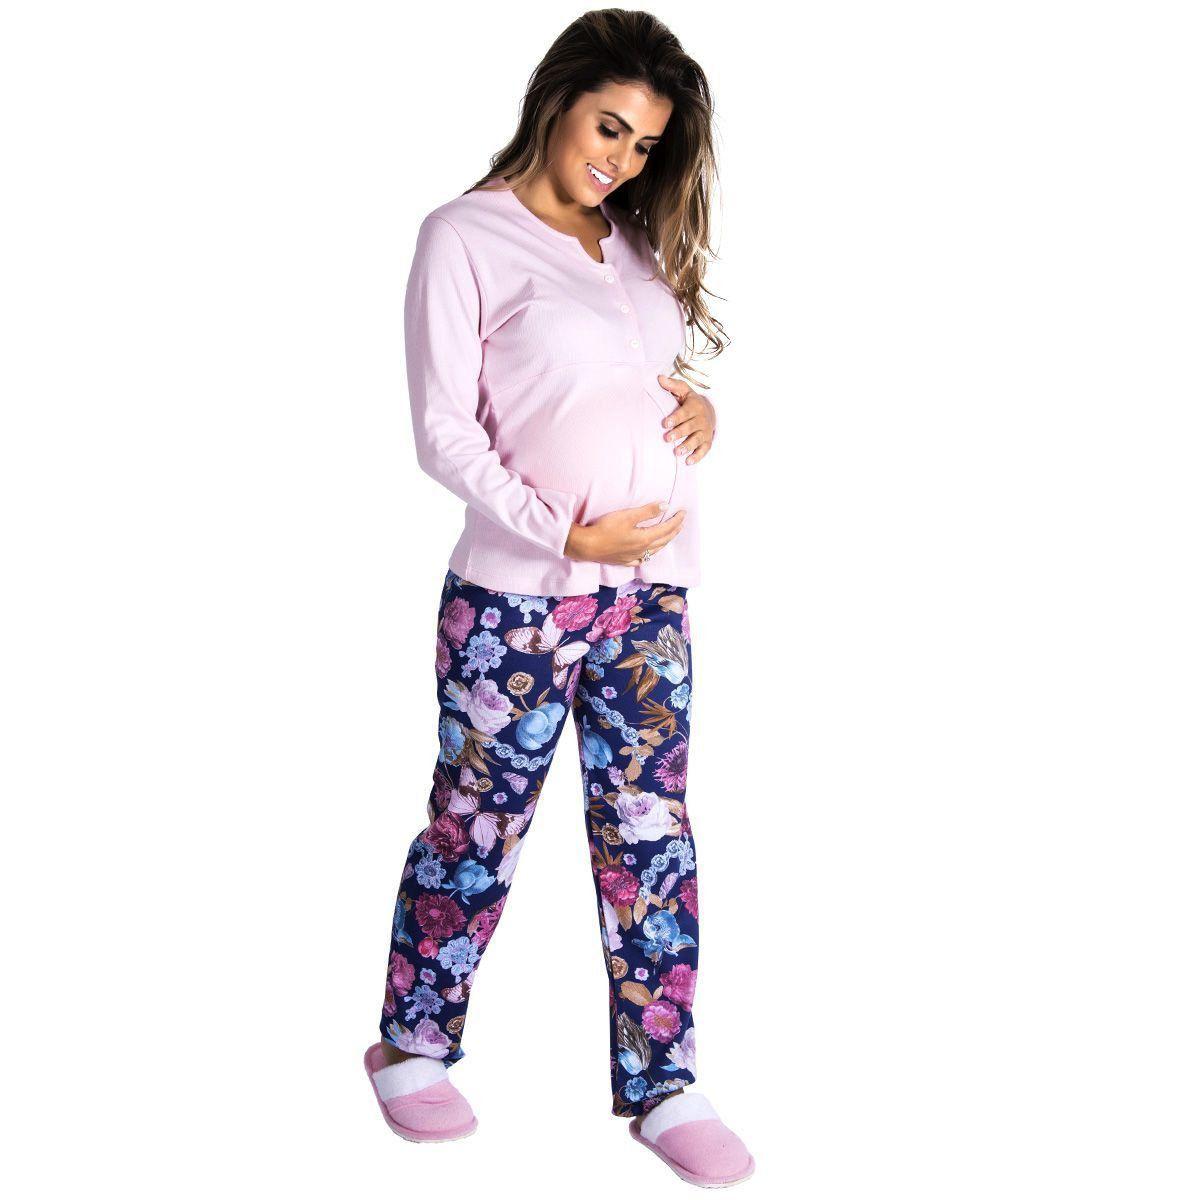 4a30026ca0 Pijama Feminino Longo Gestante Adulto Victory